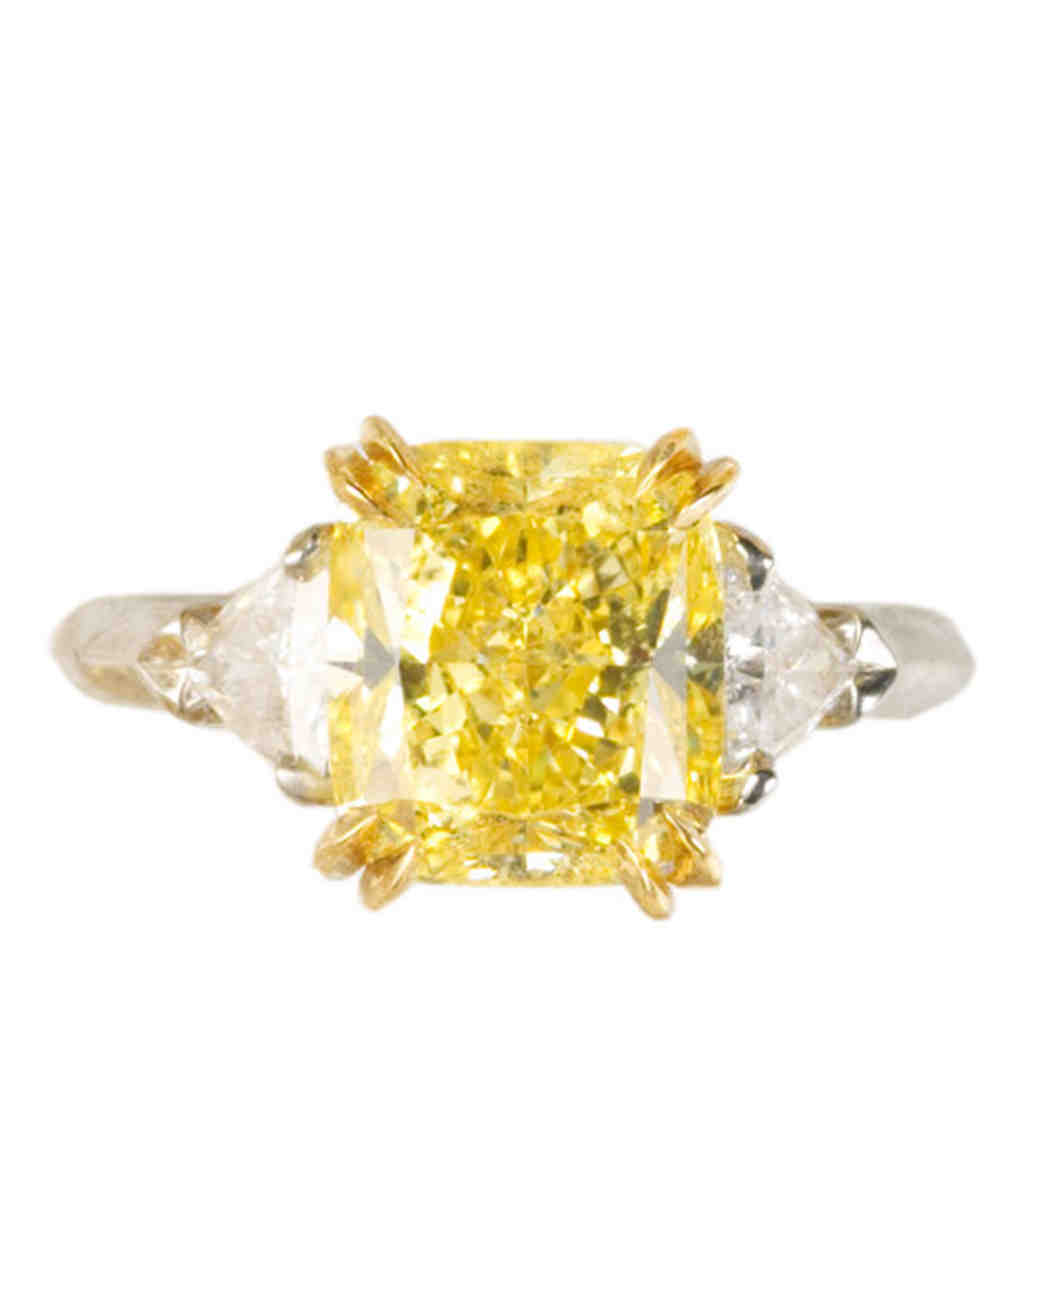 msw_sum10_yellow_ring_harrywinston.jpg